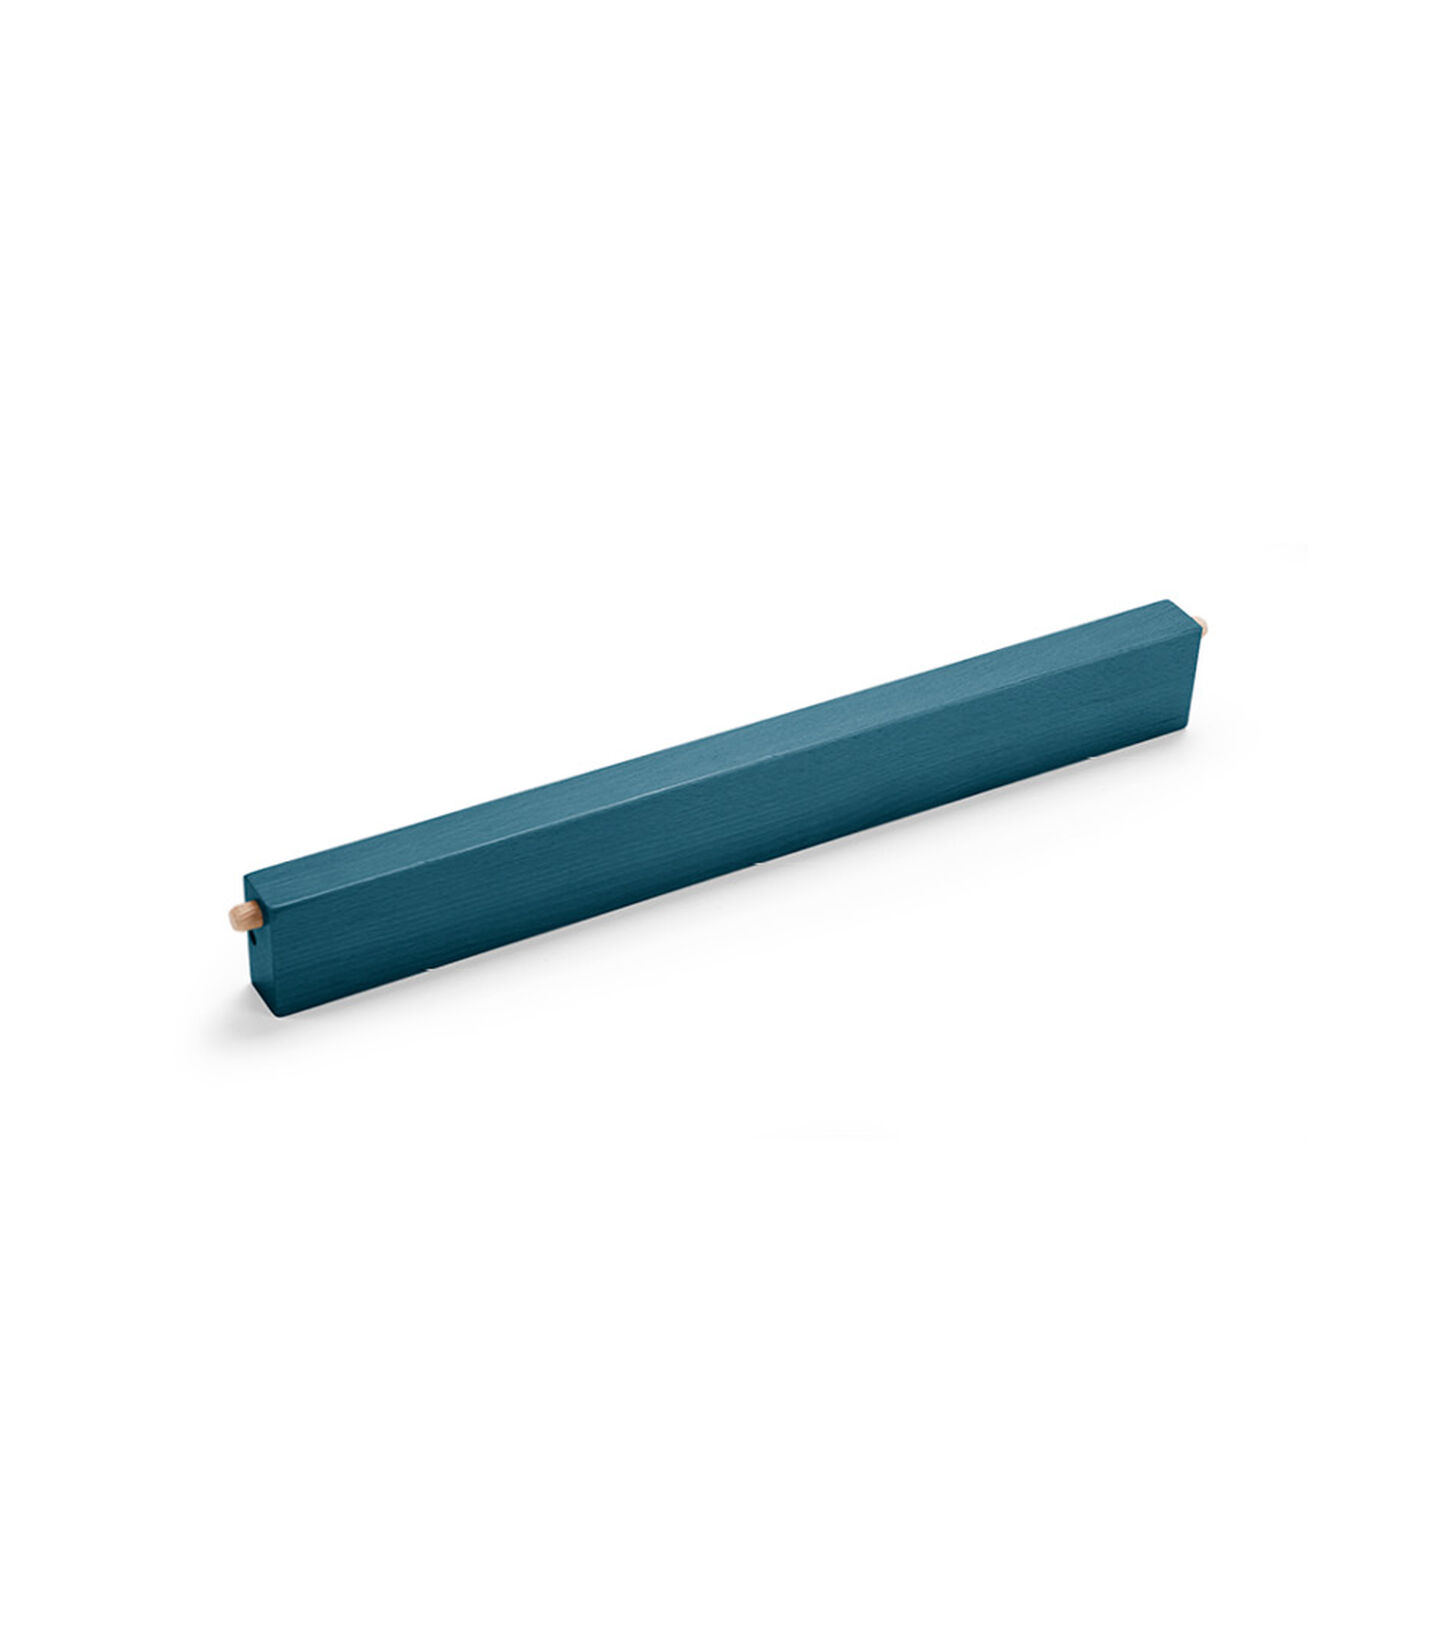 Tripp Trapp® Floorbrace Midnight Blue, Midnight Blue, mainview view 2